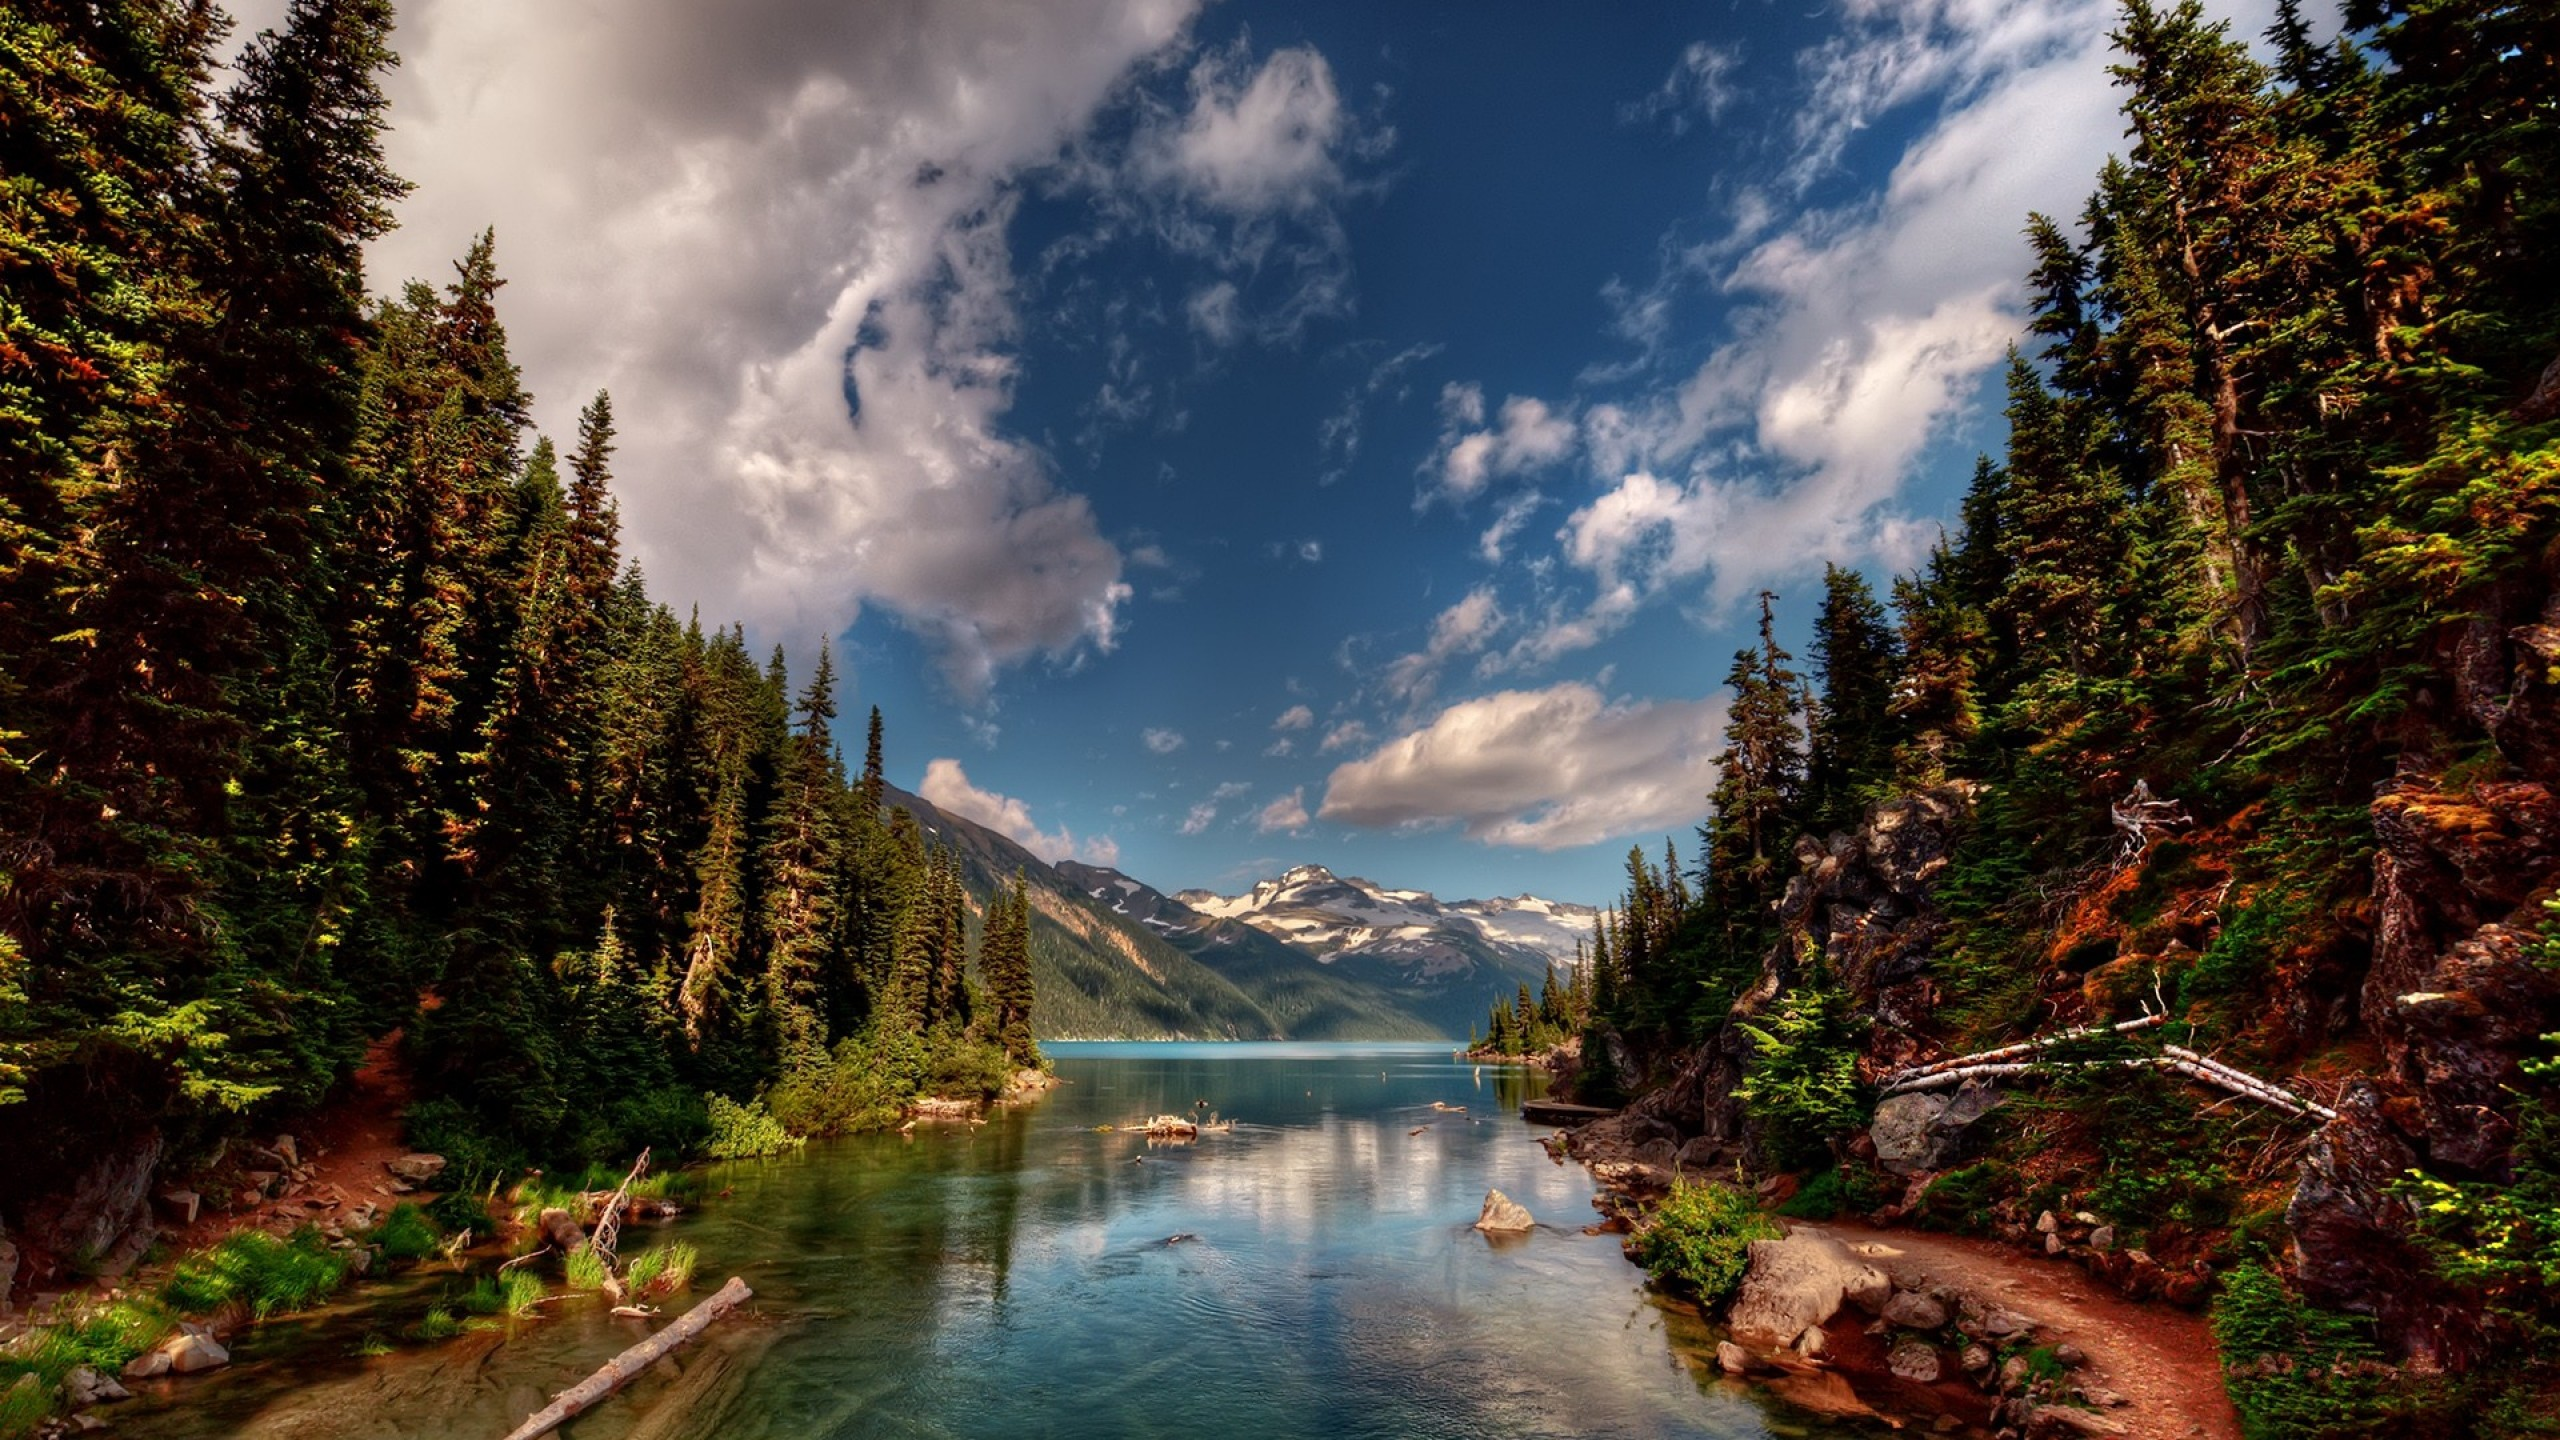 4K Nature Wallpaper (38+ images)